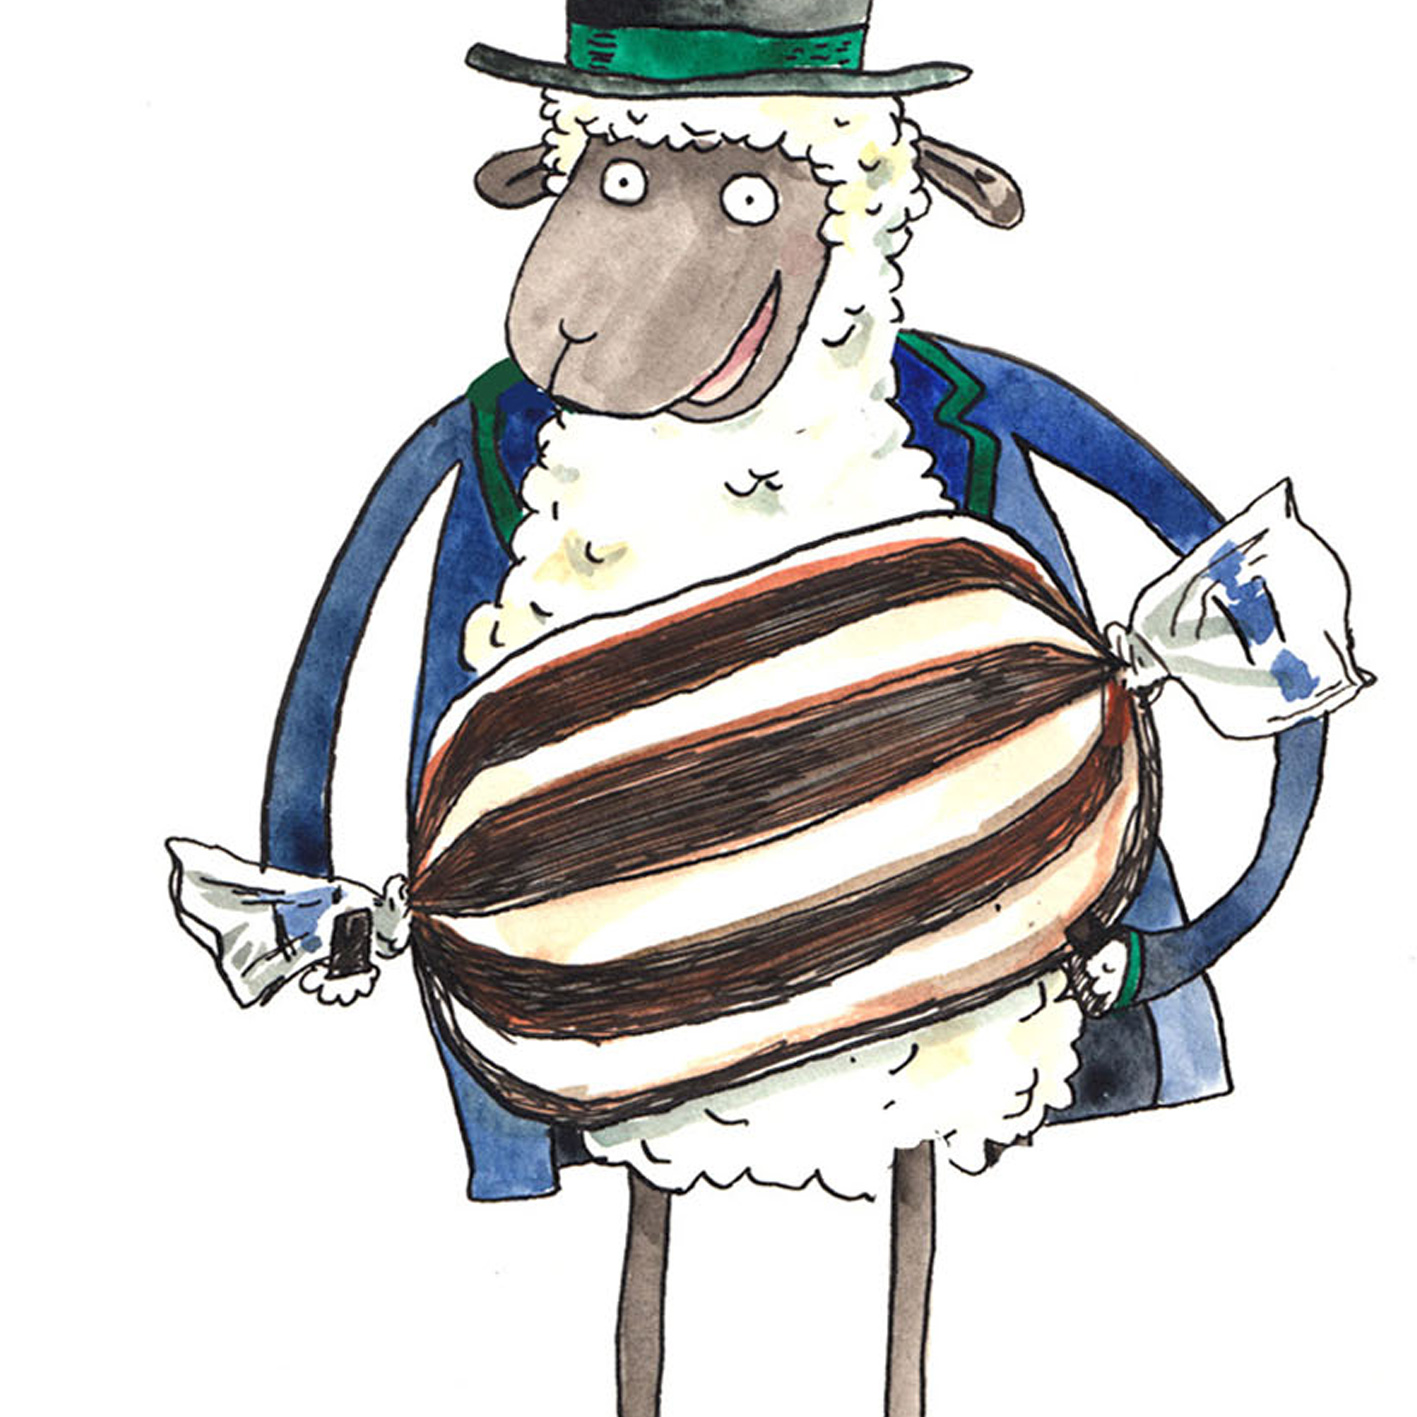 Baaa-Humbug_-Scrooge-themed-Christmas-card-with-sheep-pun_CH12_CU